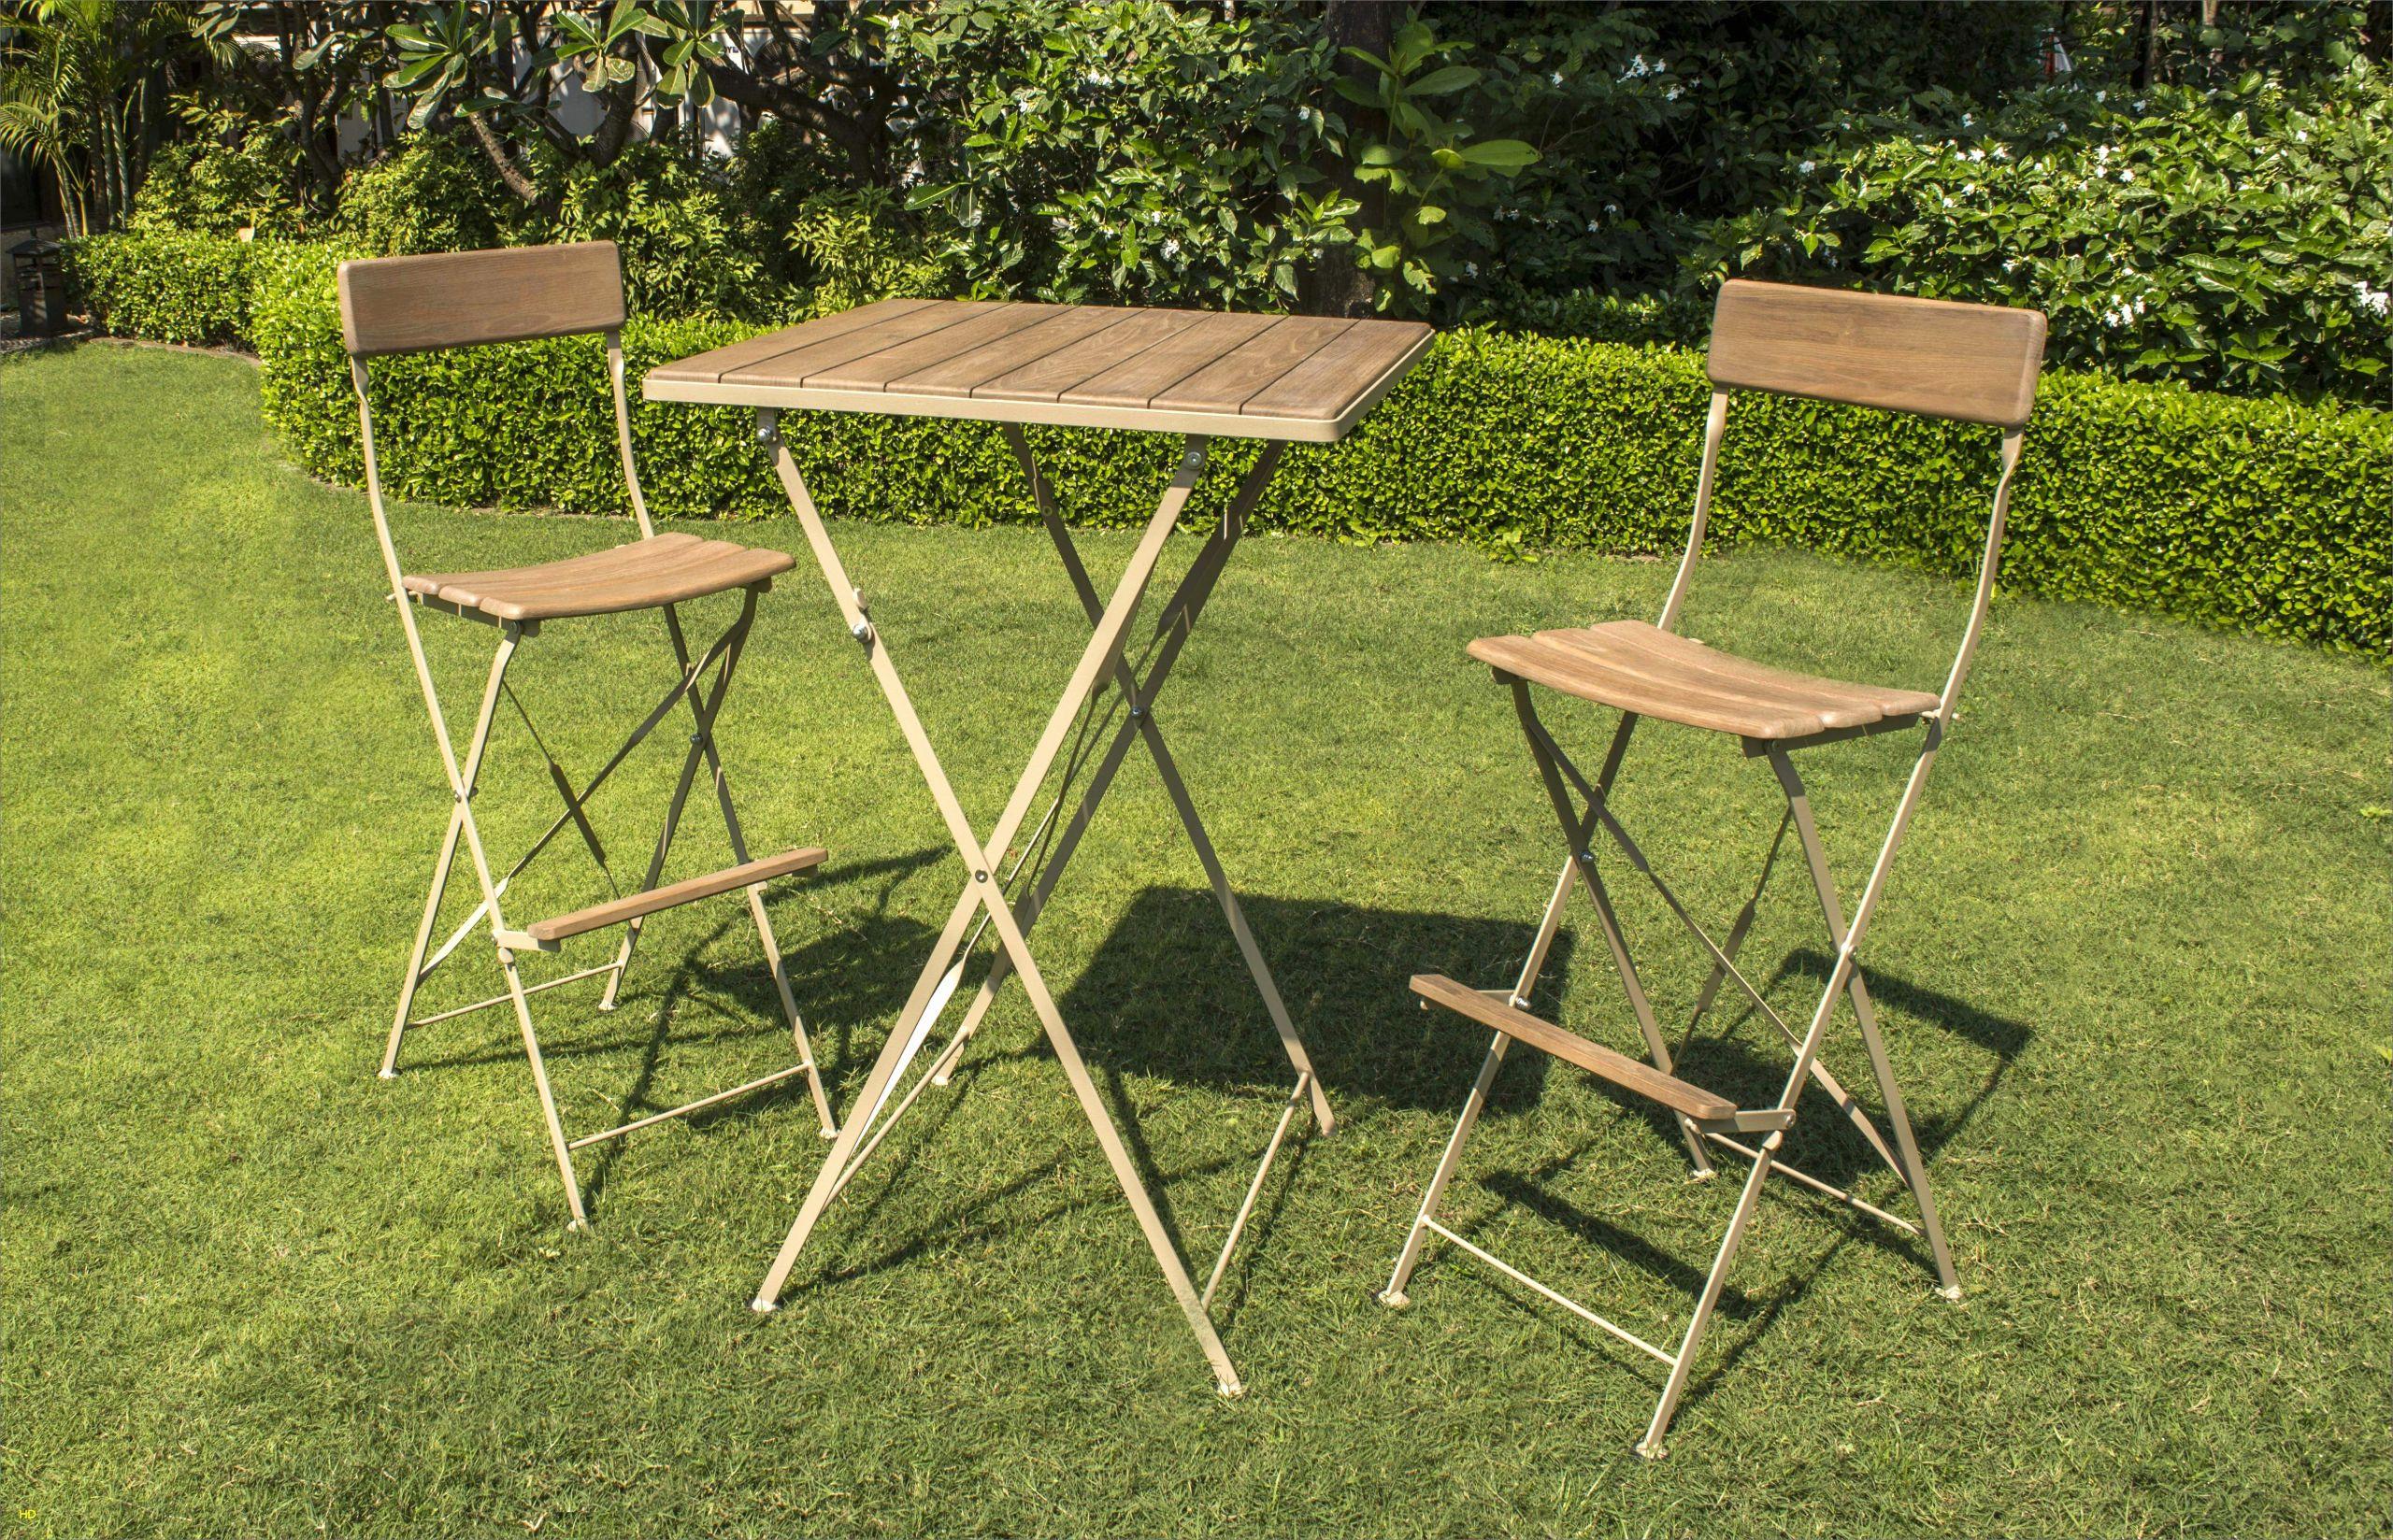 carrefour meuble de jardin frais salon de jardin resine carrefour chaise basse de jardin chaise of carrefour meuble de jardin